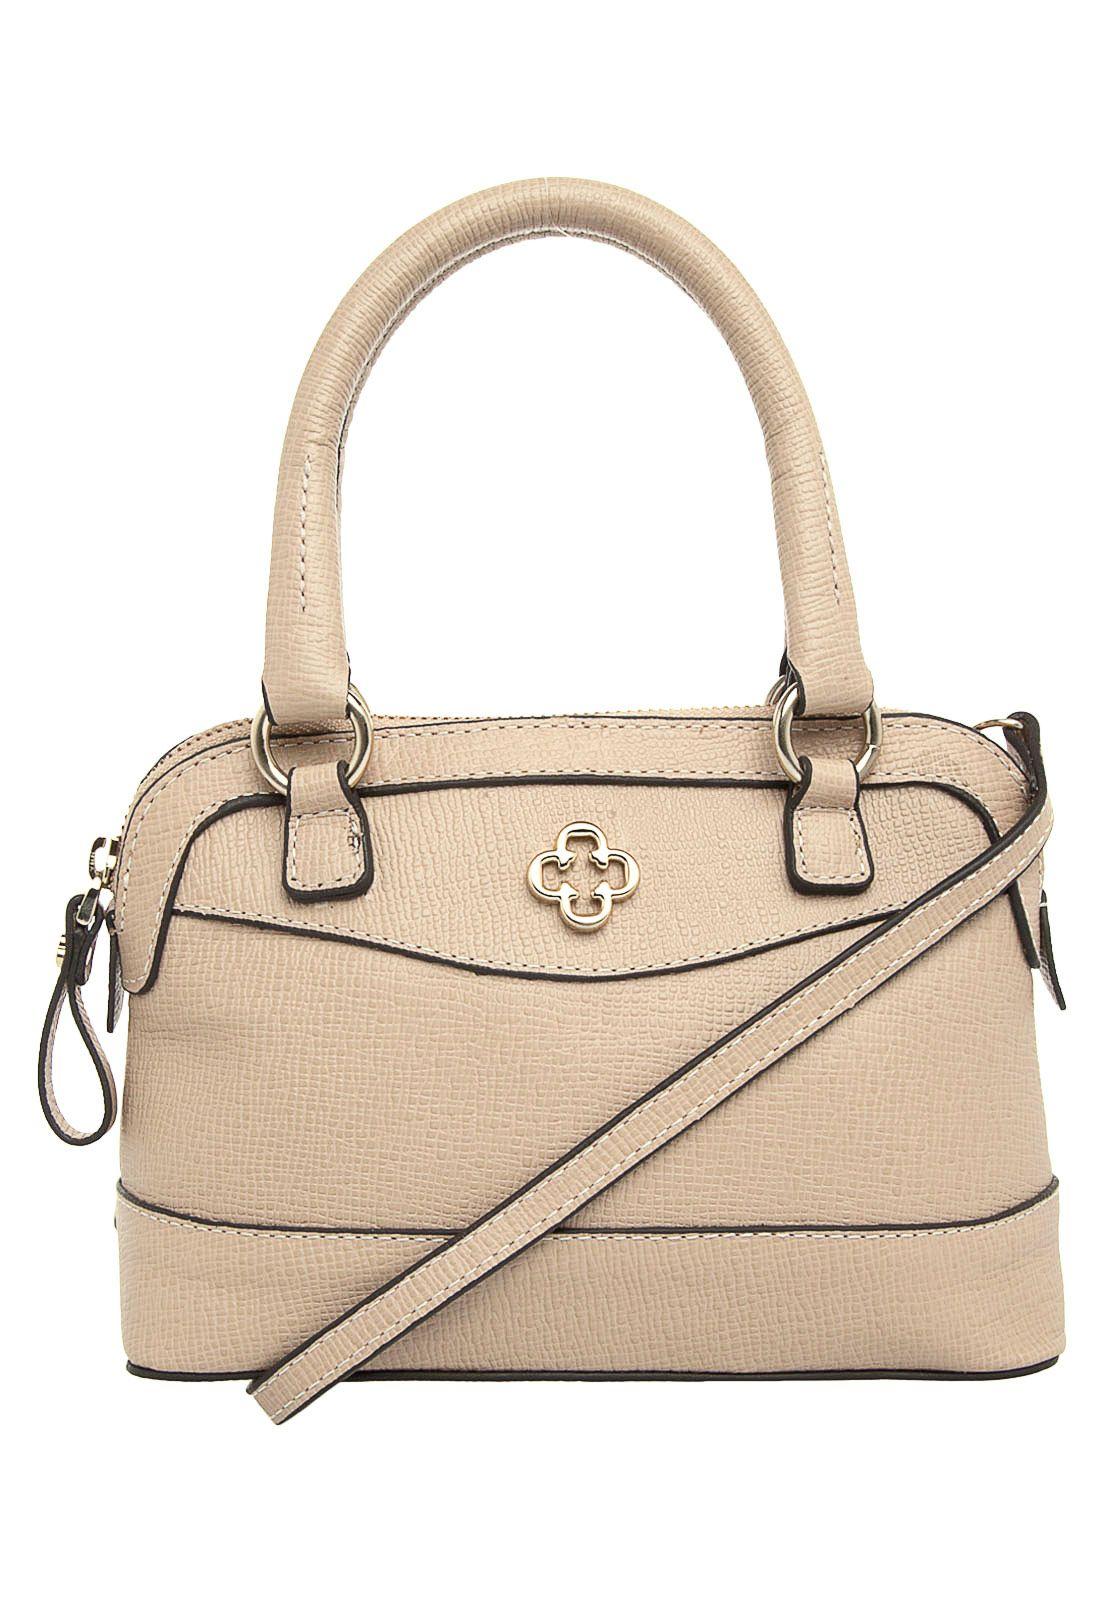 e7545de3ccc4 Bolsa Tiracolo Capodarte Bege | 0133 Shoes & Bags | Bags, Shoe bag ...